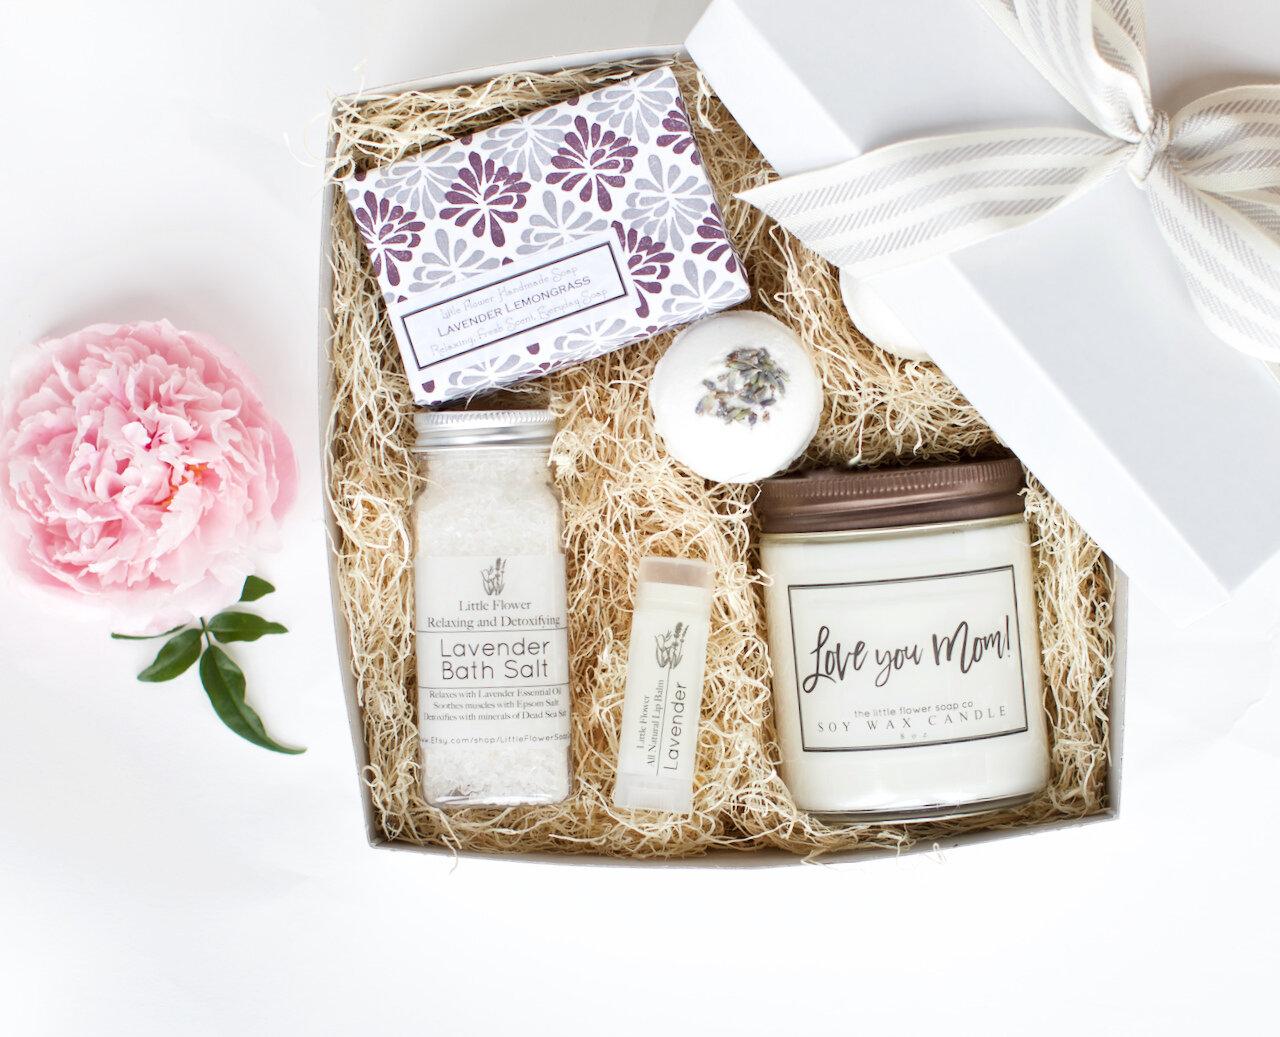 Luxury Lavender Gift Box Handmade Aromatherapy Lavender Spa Gift Basket For Women